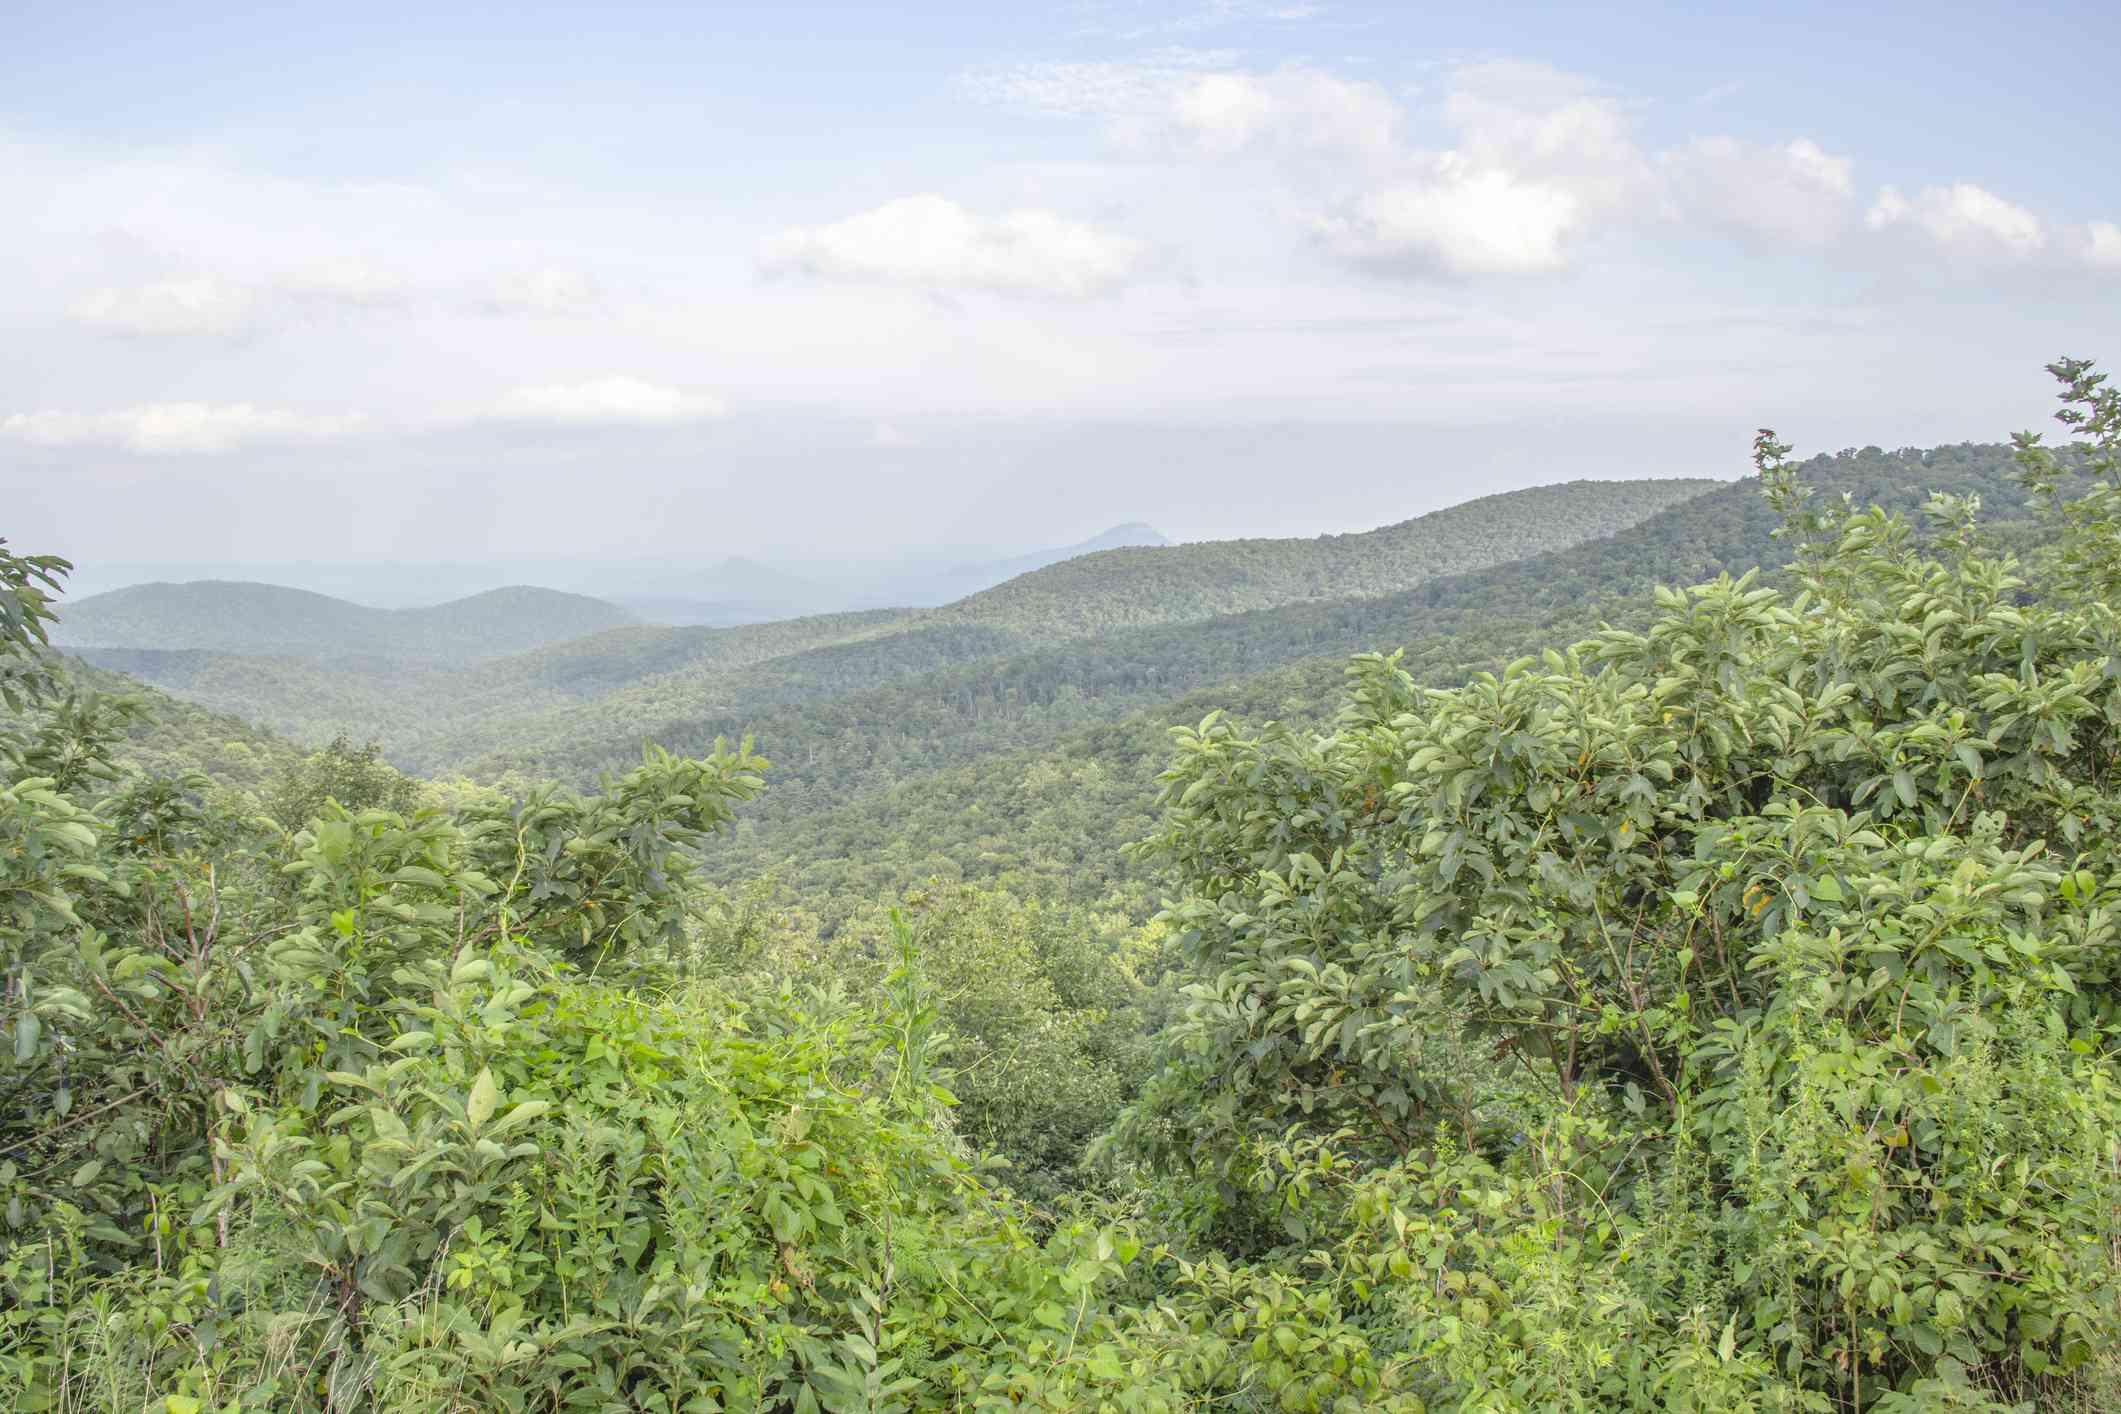 Lush green mountain vista in Chattahoochee National Forest